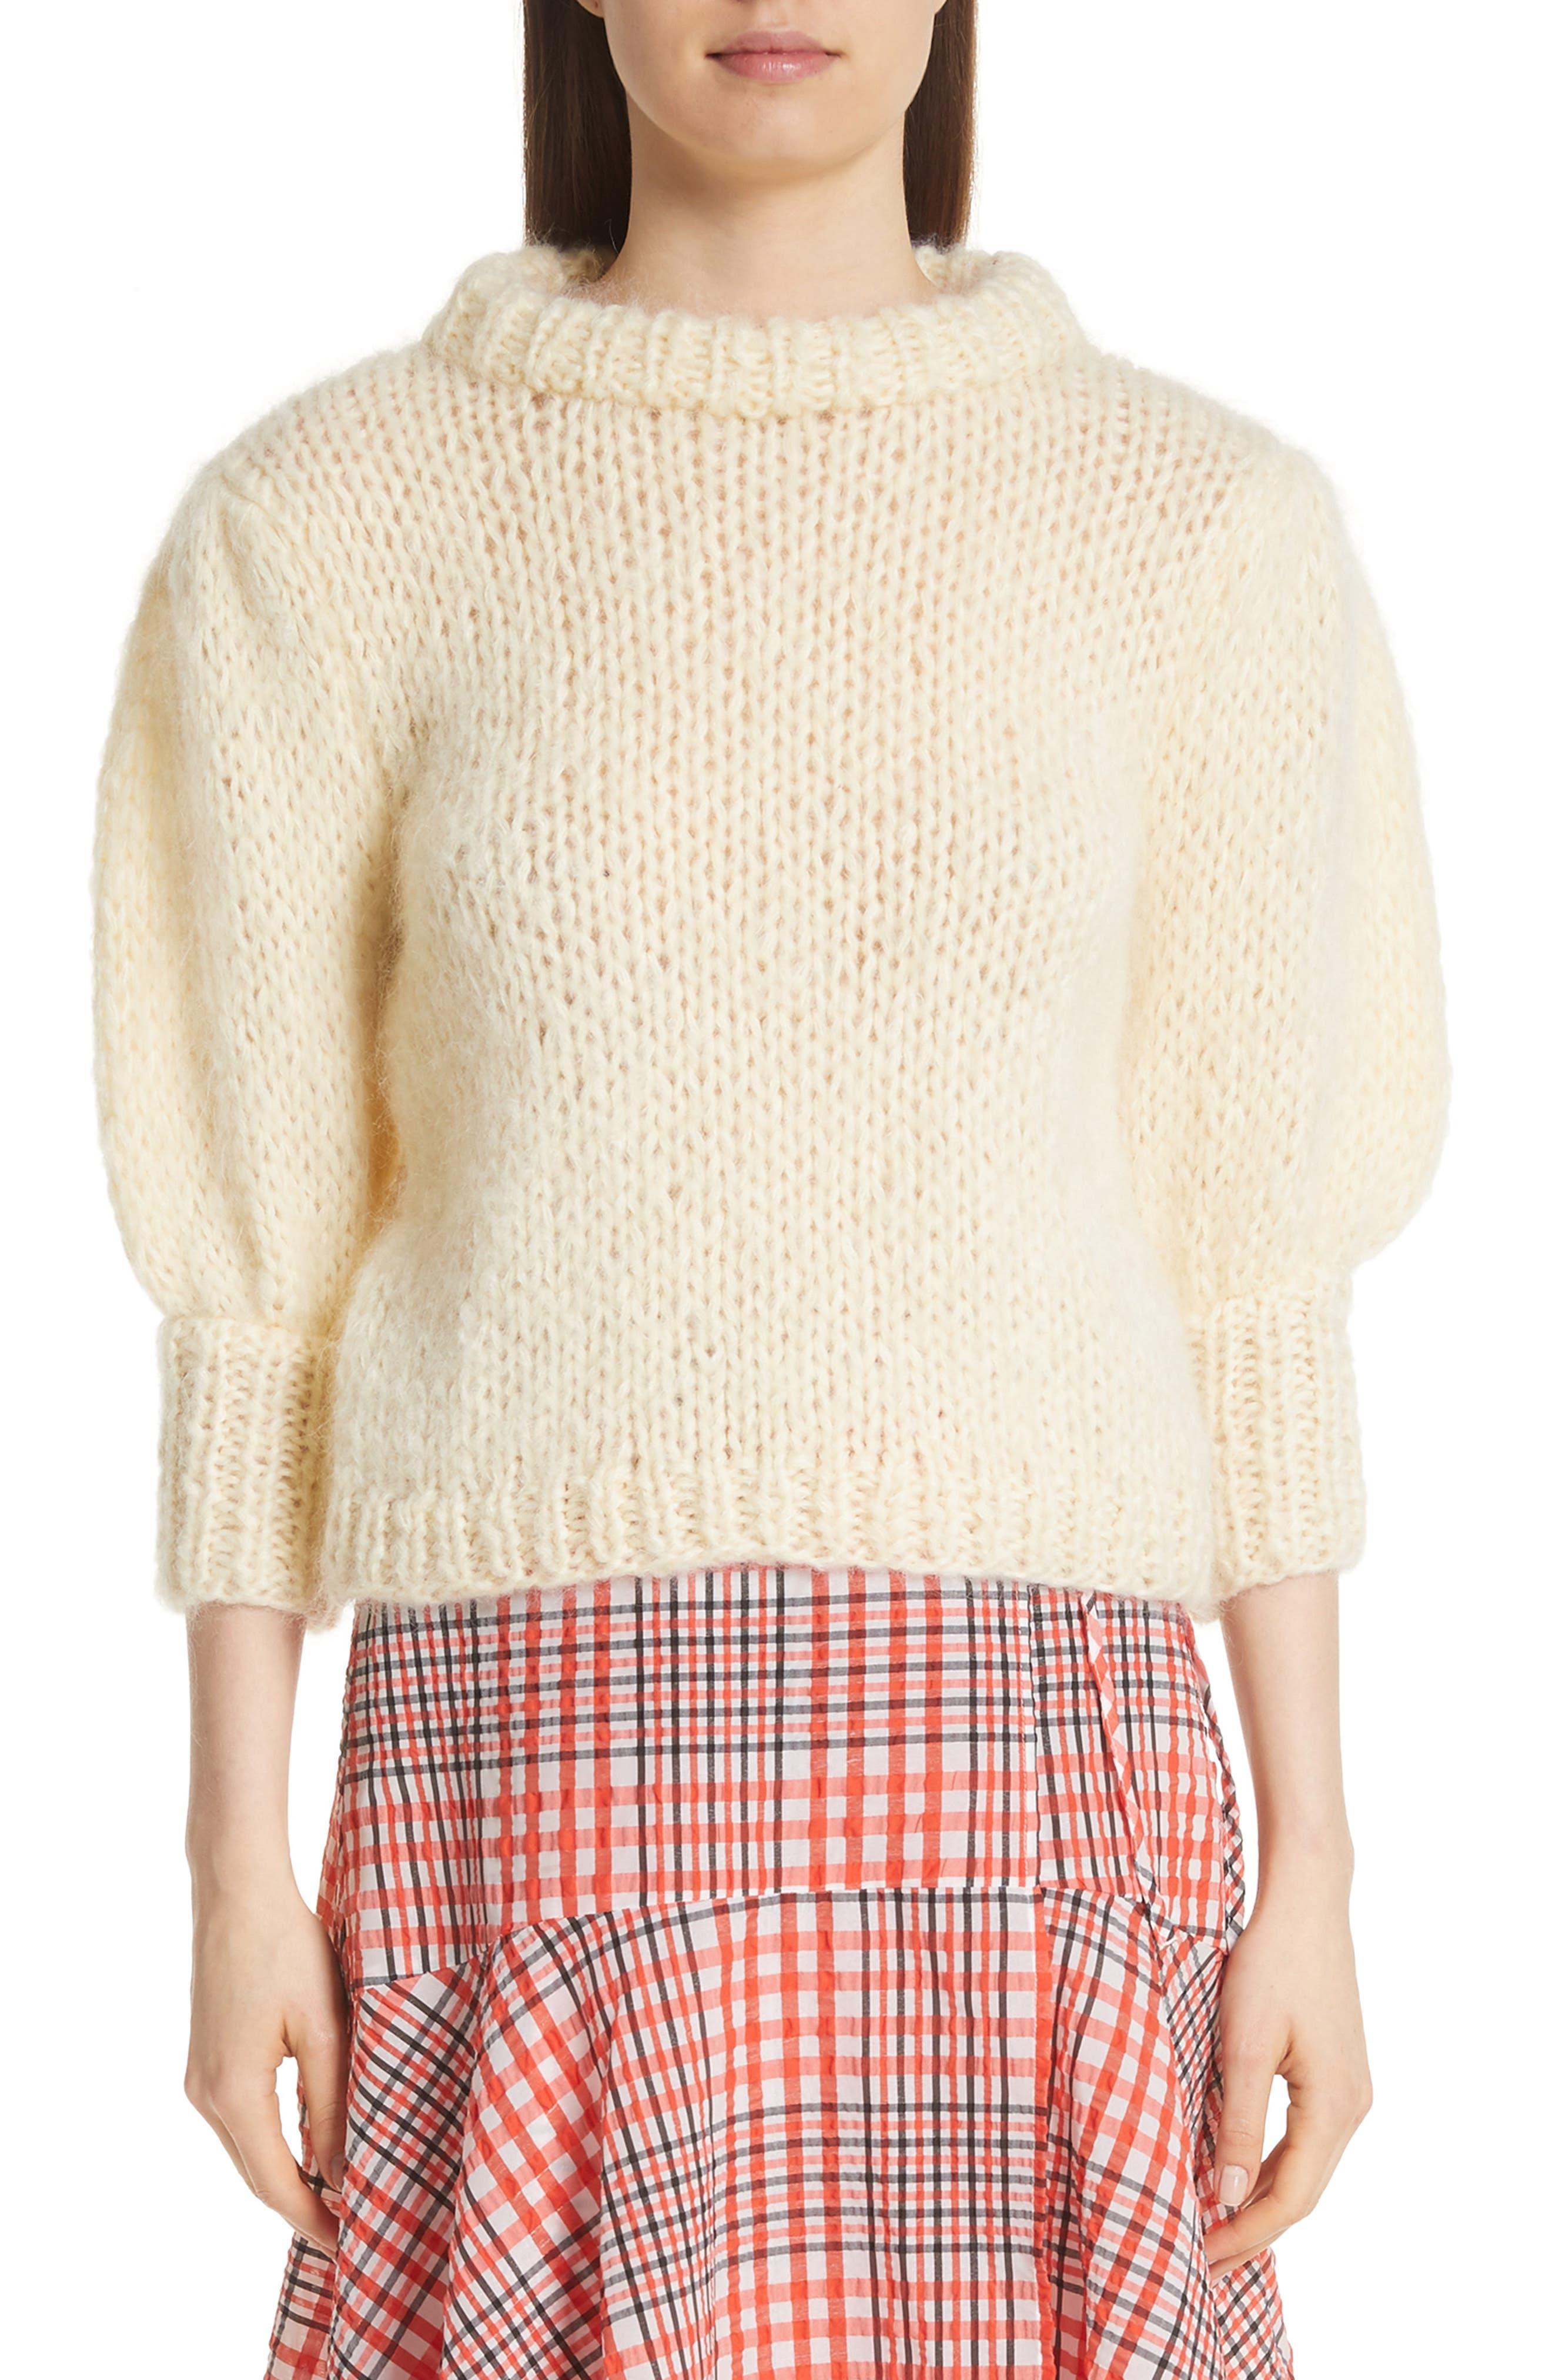 Juilliard Mohair & Wool Puff Sleeve Sweater,                         Main,                         color, 900